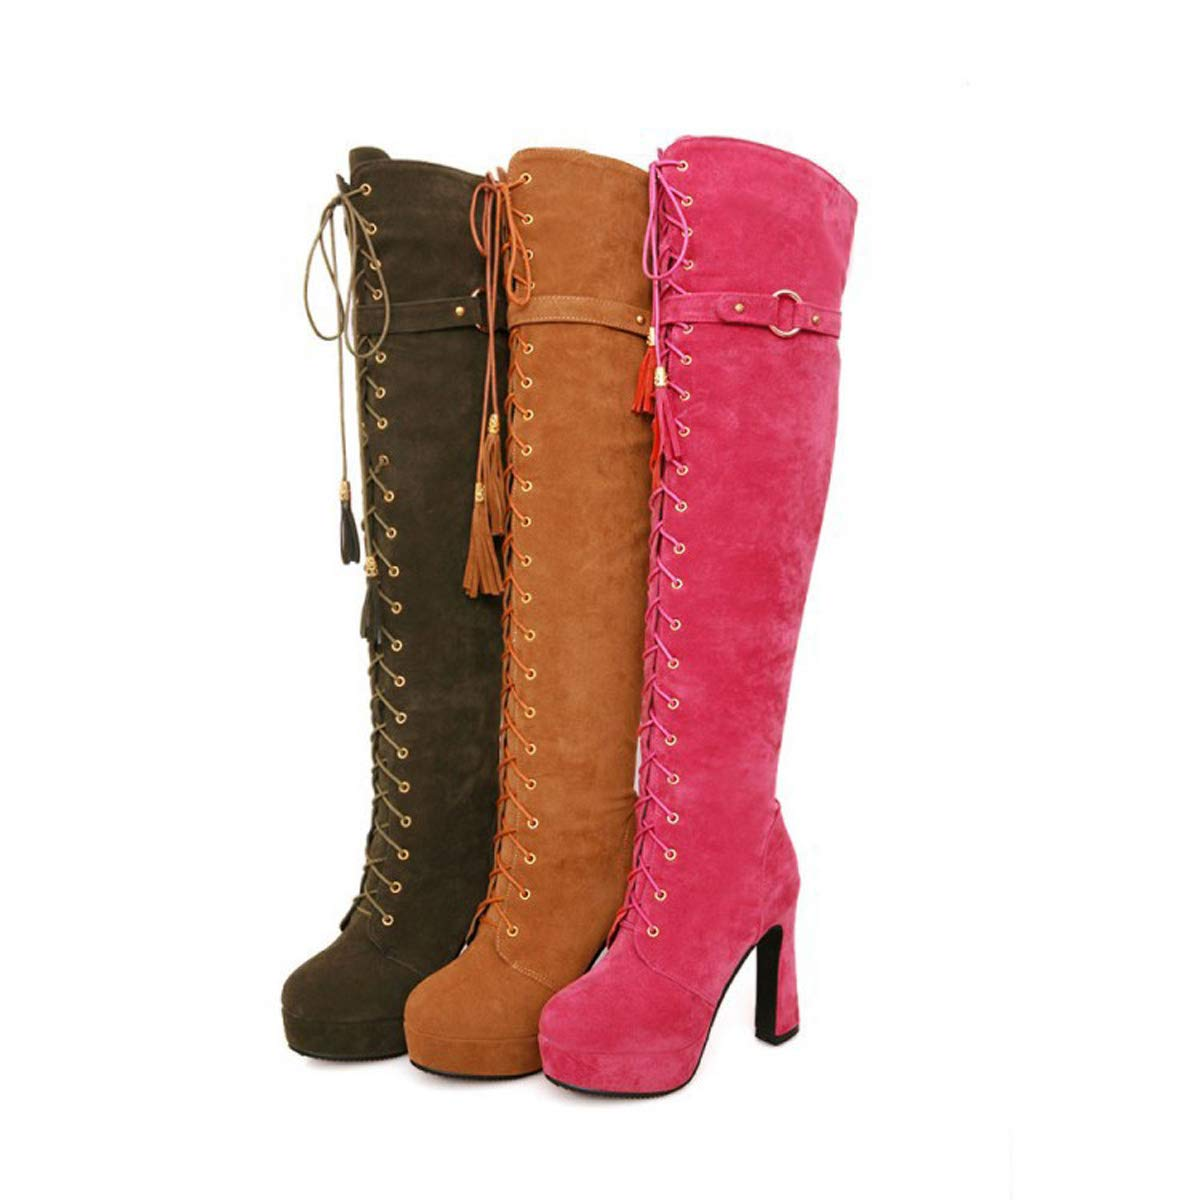 DANDANJIE DANDANJIE DANDANJIE Damenstiefel Overknee-Stiefel mit hohem Absatz Schnürschuh Coole Ritterstiefel für den Herbst-Frühling 1a9bcd